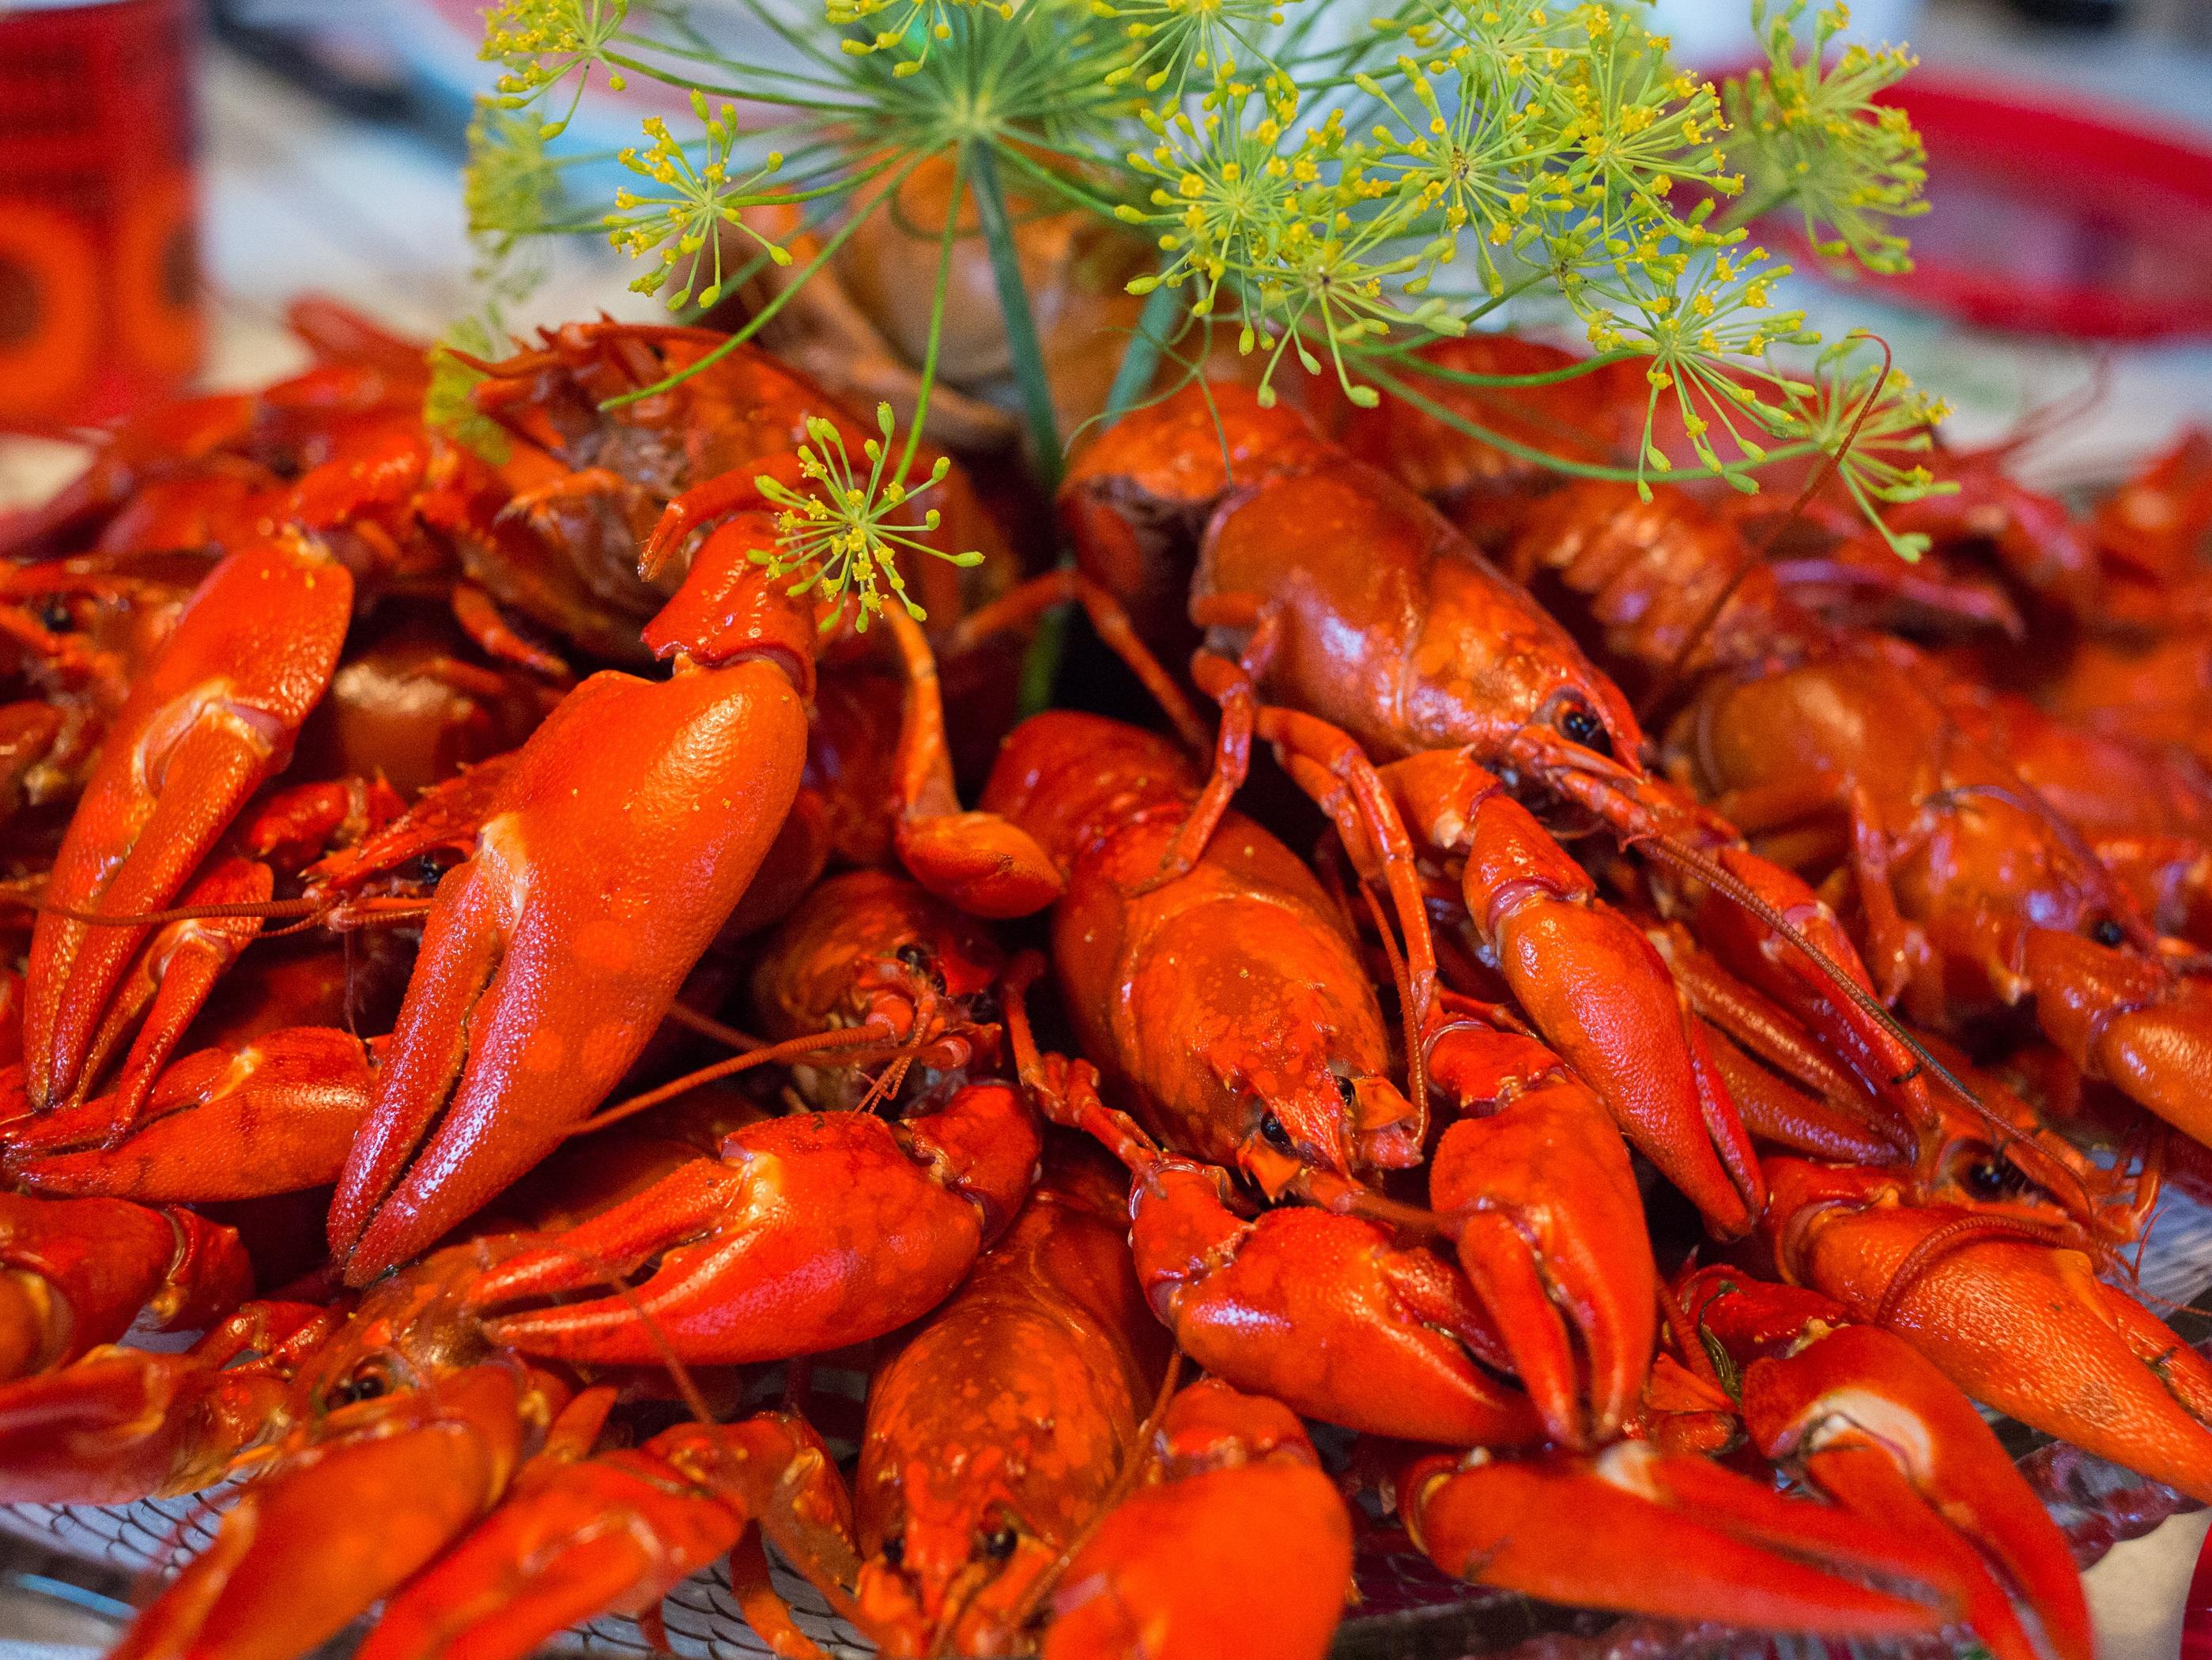 Free Images : fall, food, produce, fish, invertebrate, crustacean, dinner, crabs, crayfish ...